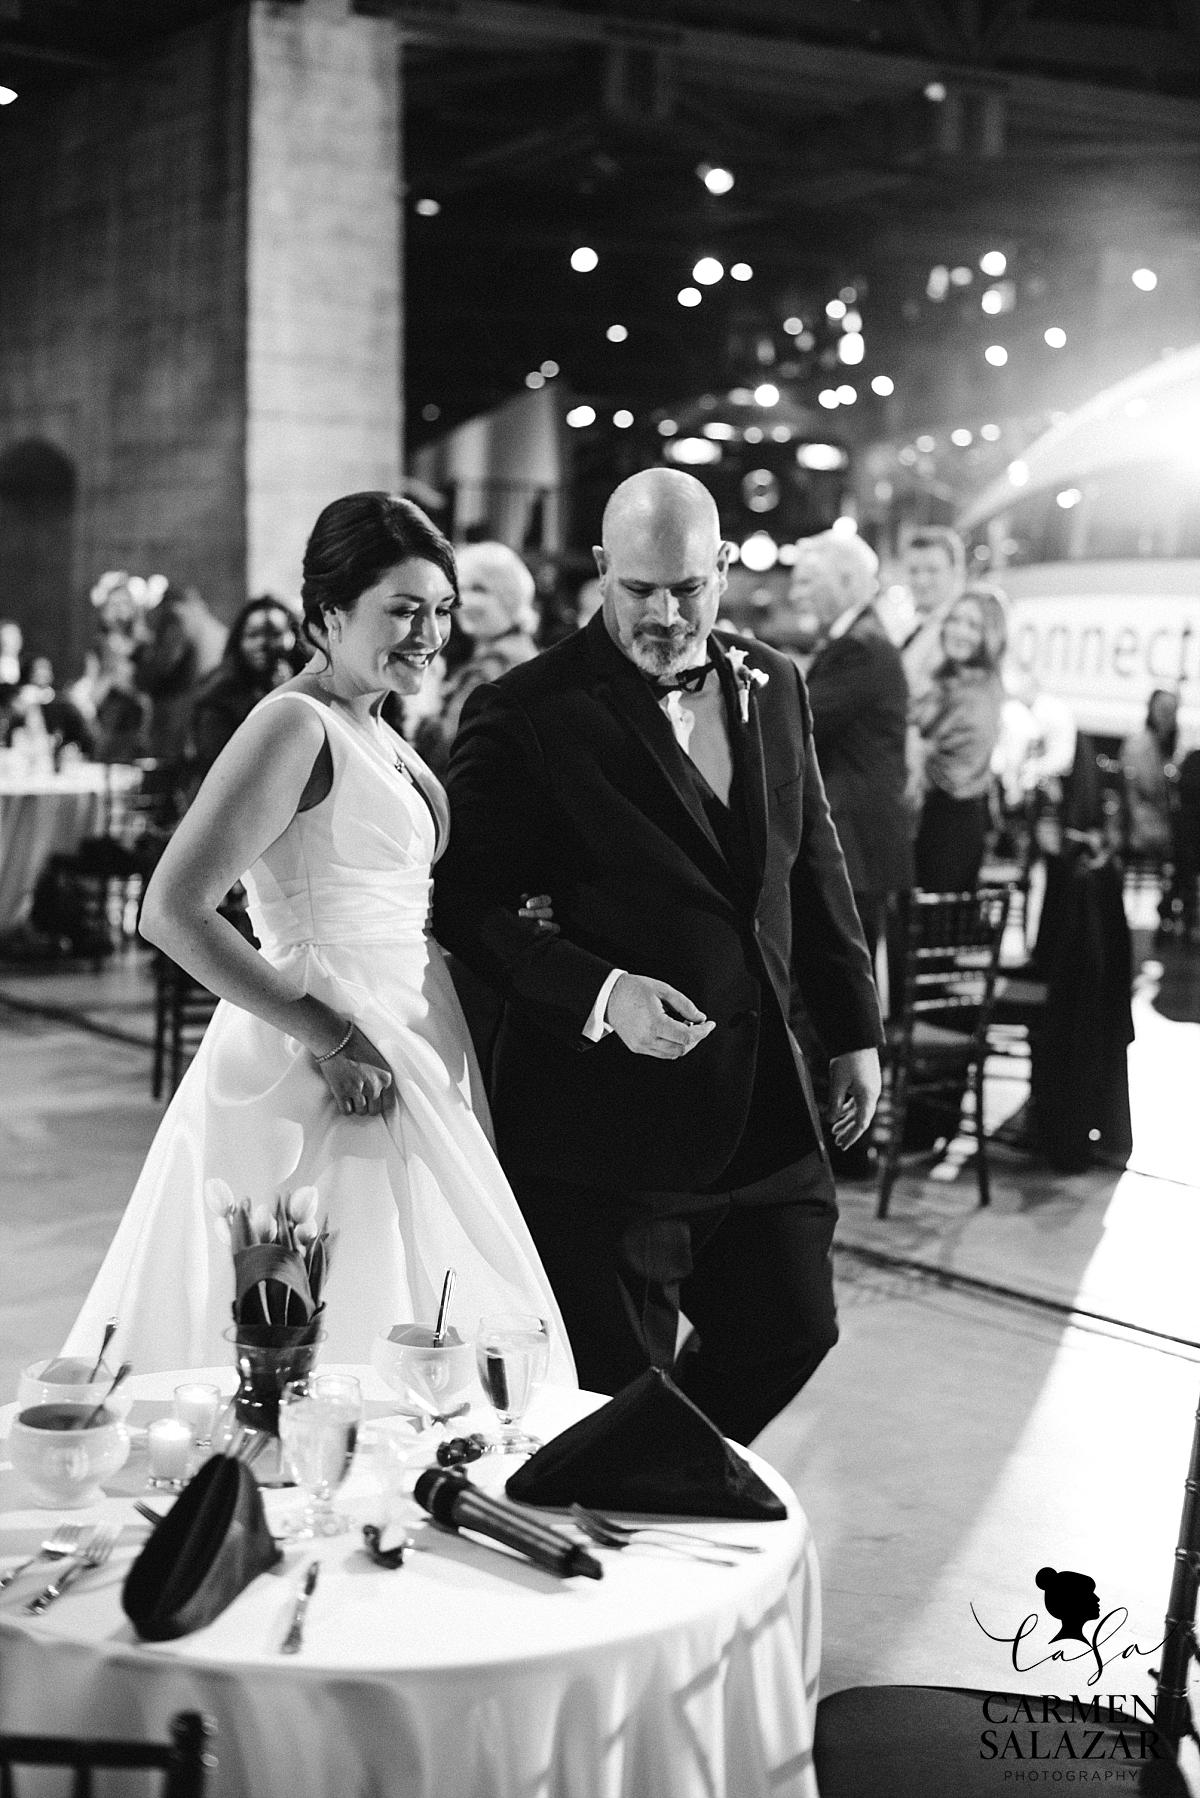 Grand entry to museum wedding reception - Carmen Salazar